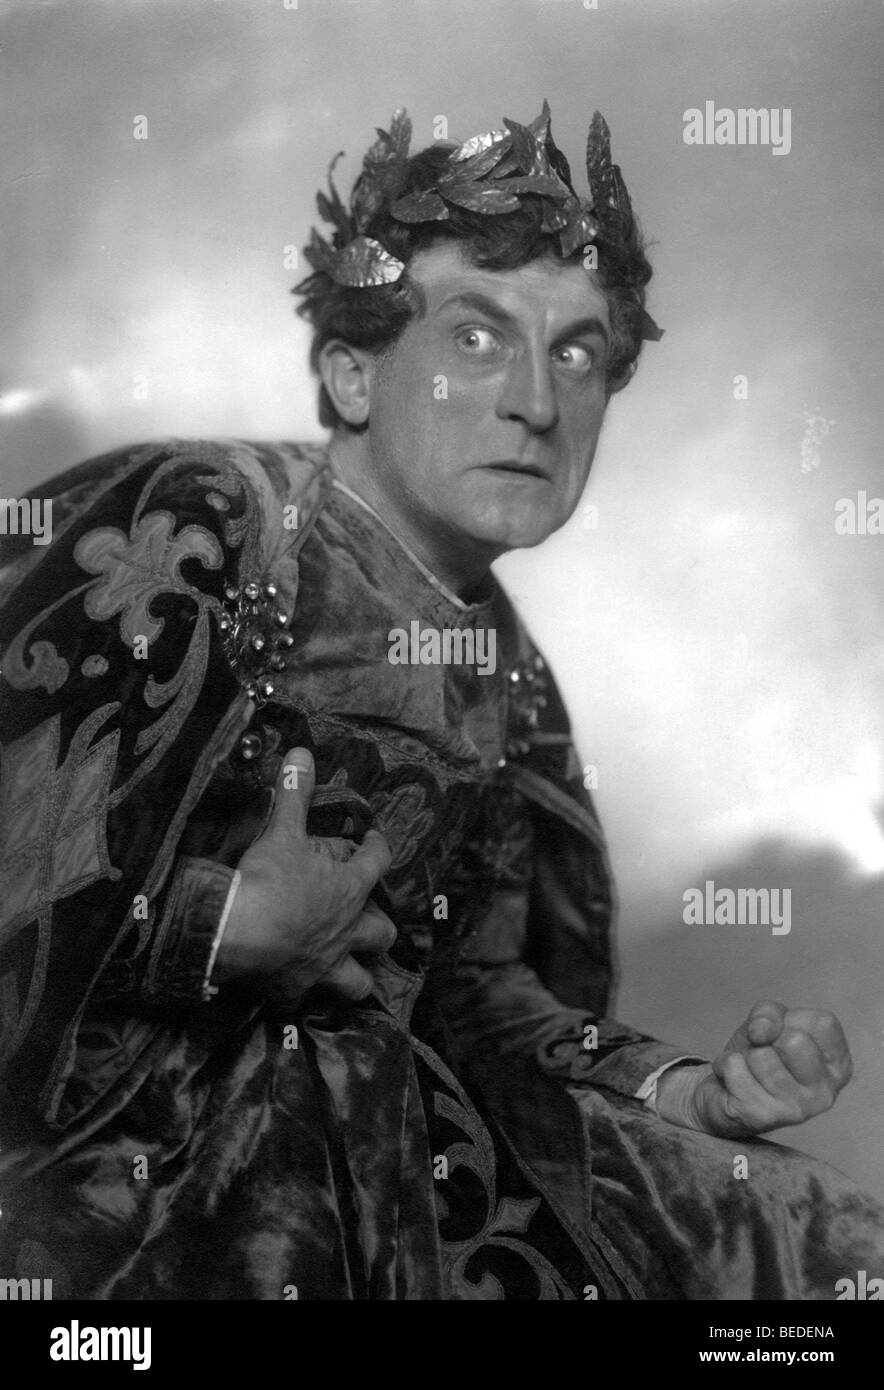 Historic photograph, Caesar, around 1930 - Stock Image